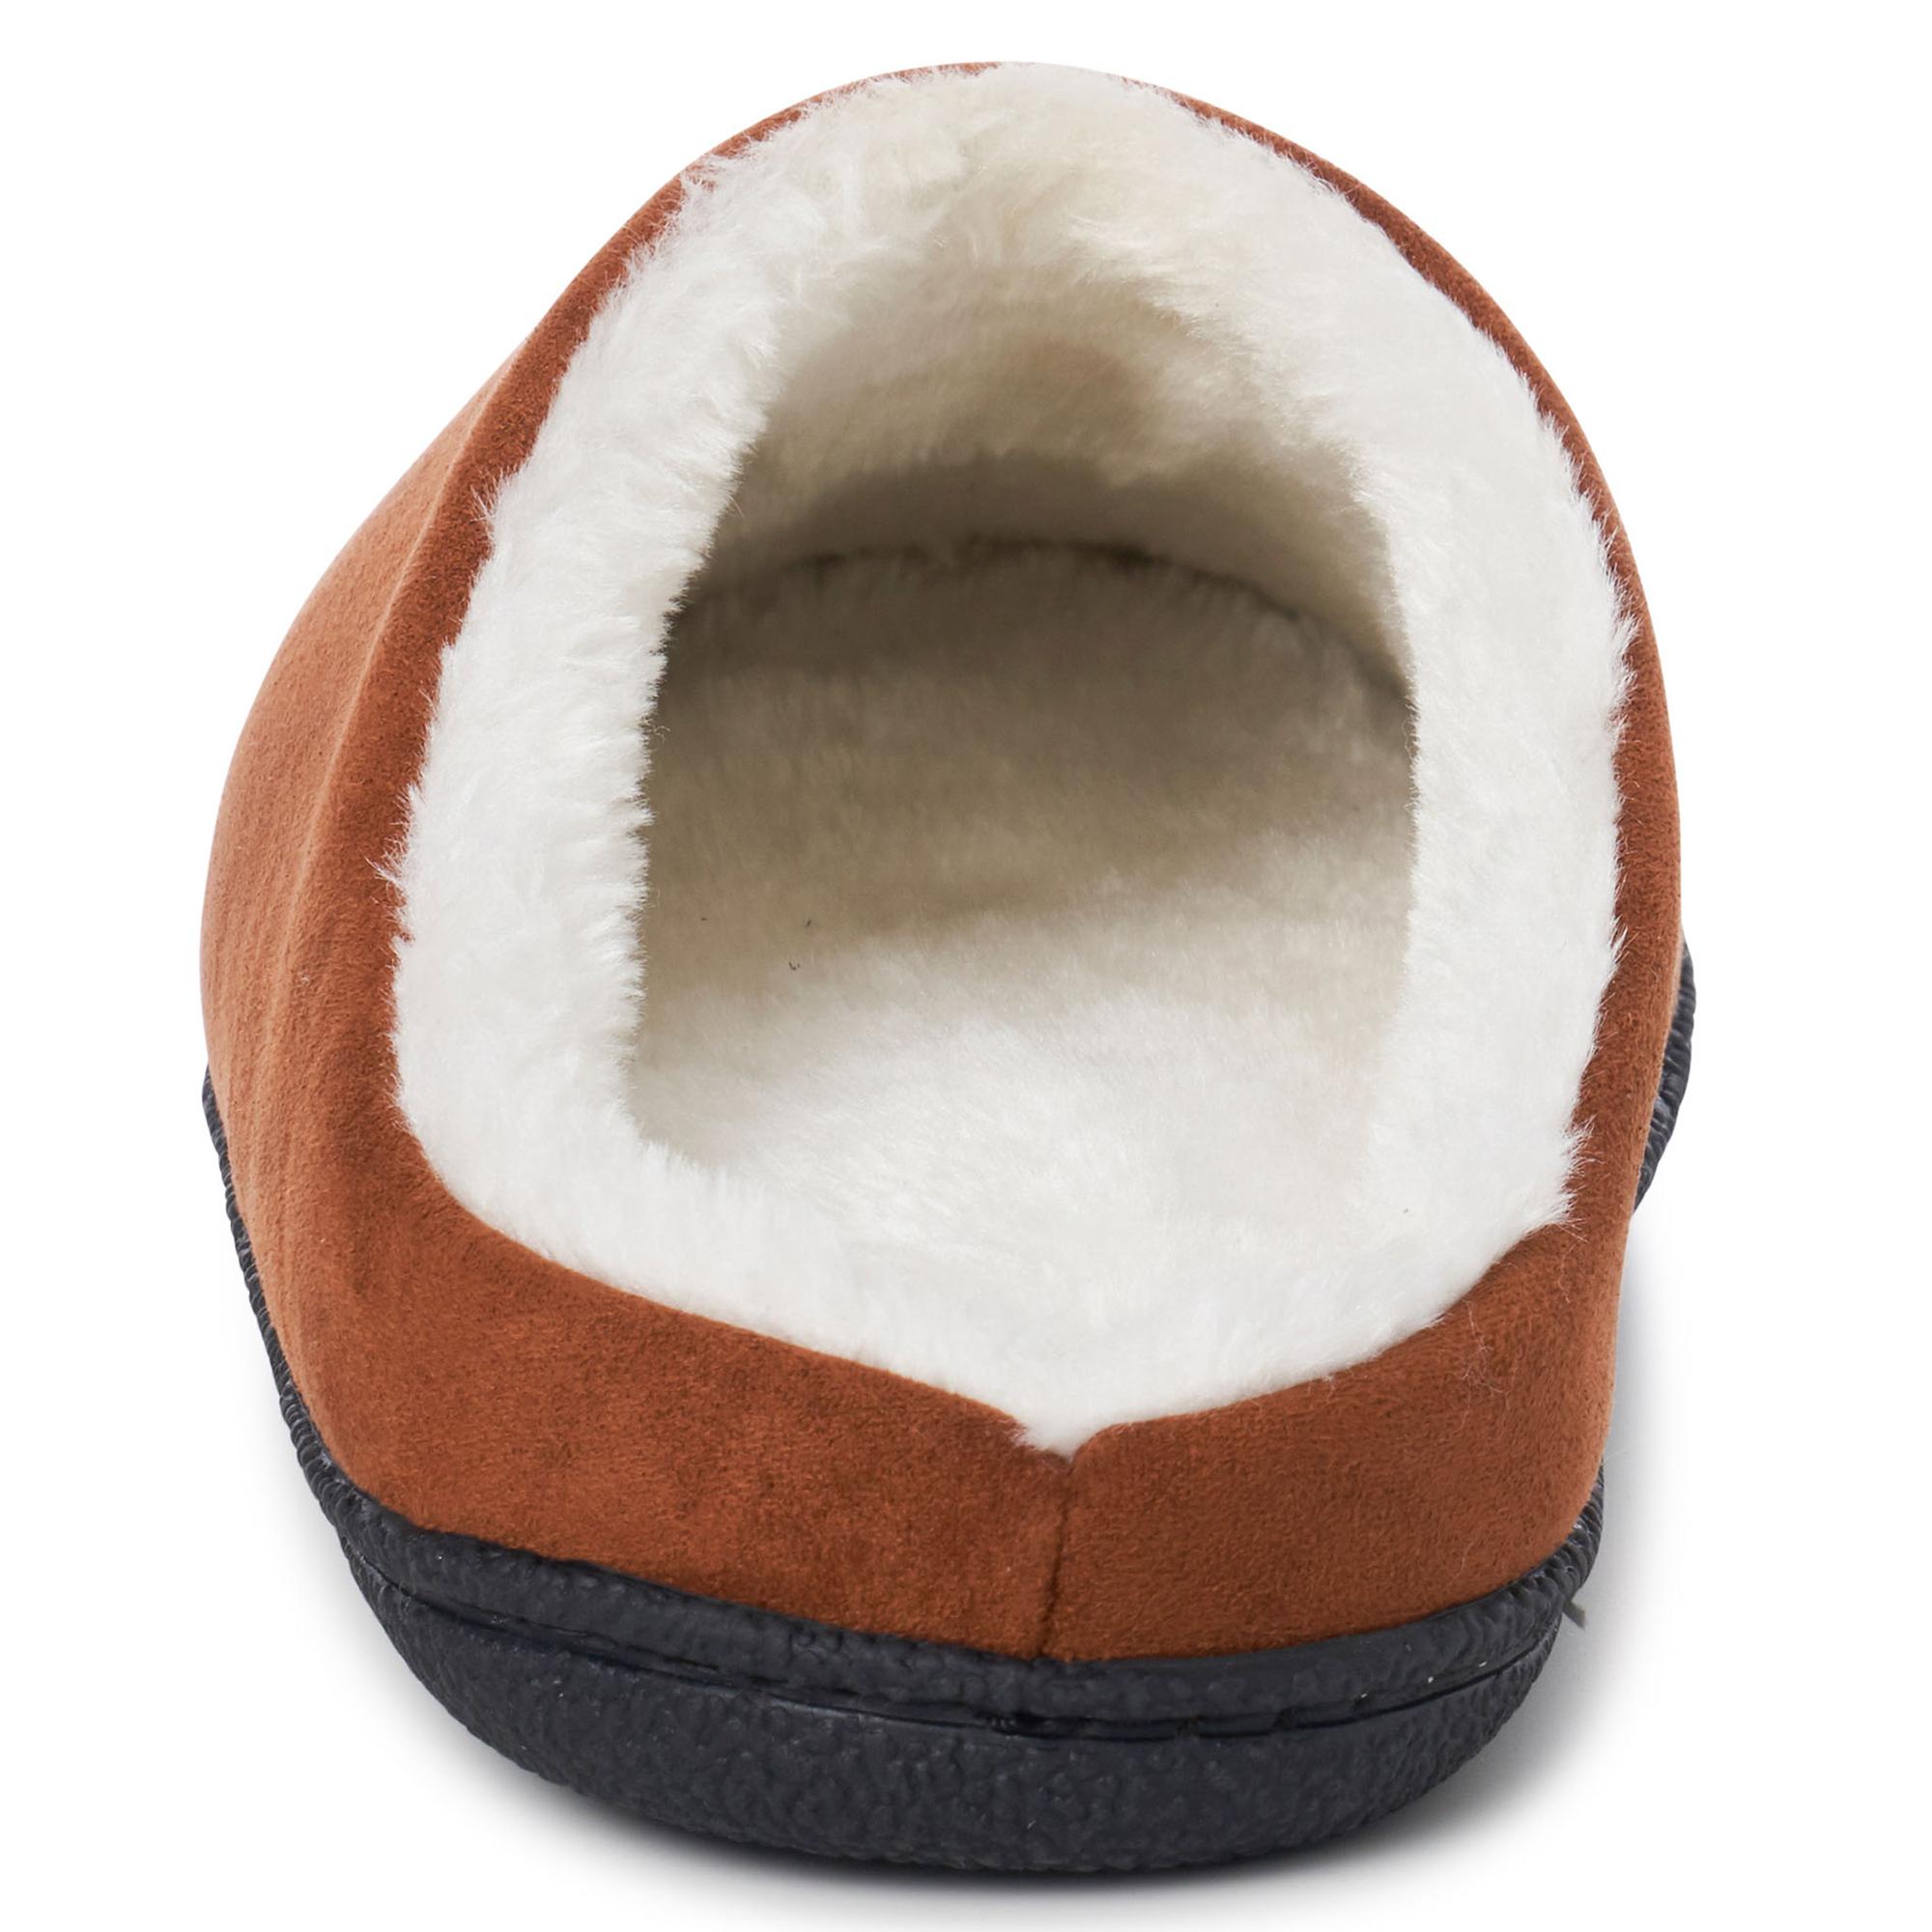 Alpine-Swiss-Mens-Memory-Foam-Clog-Slippers-Indoor-Comfort-Slip-On-House-Shoes thumbnail 21